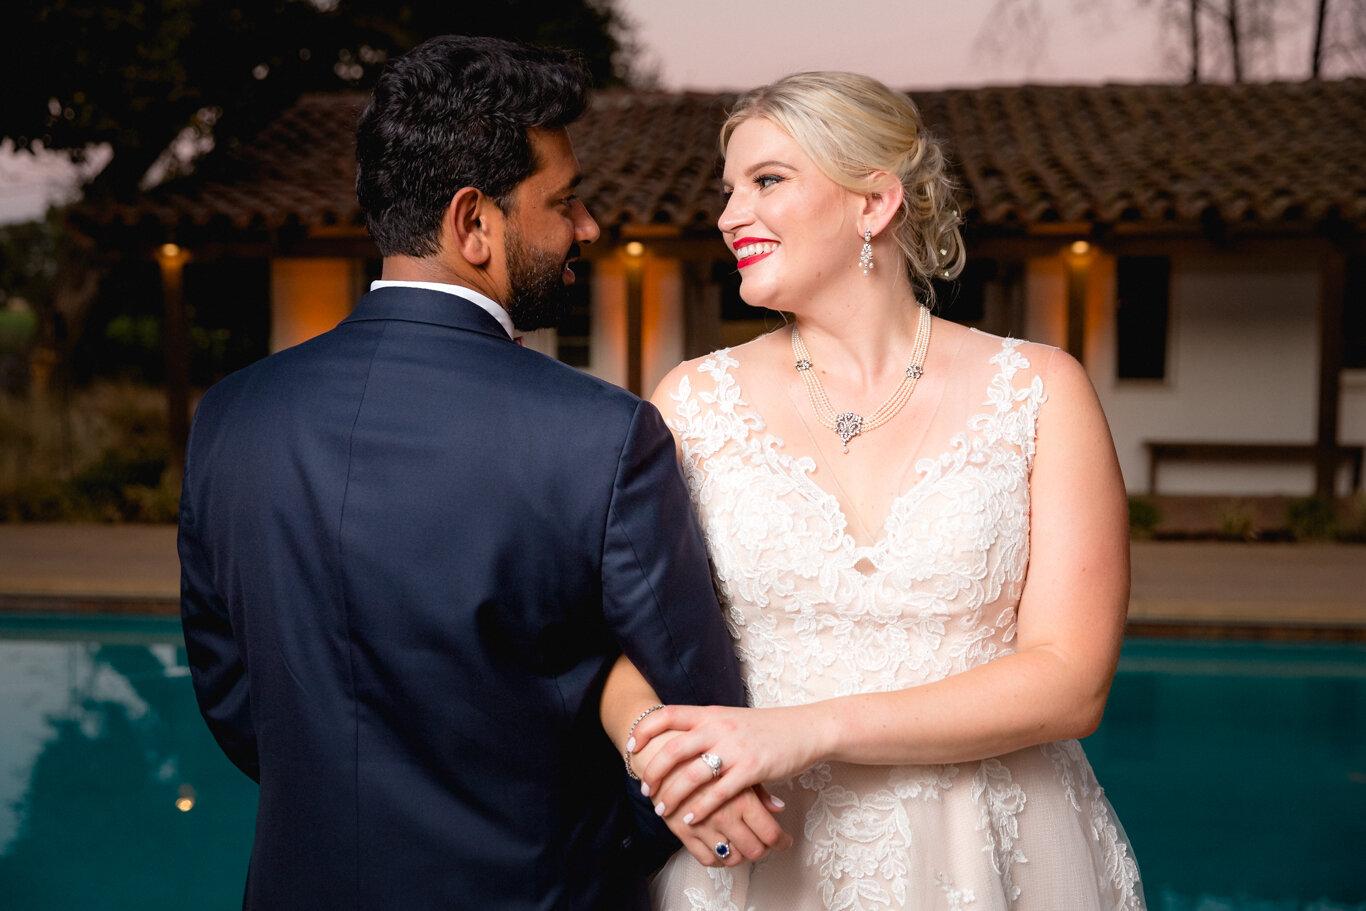 2019.08.24_Emily-Ashir-Wedding-at-the-Maples-6377.jpg